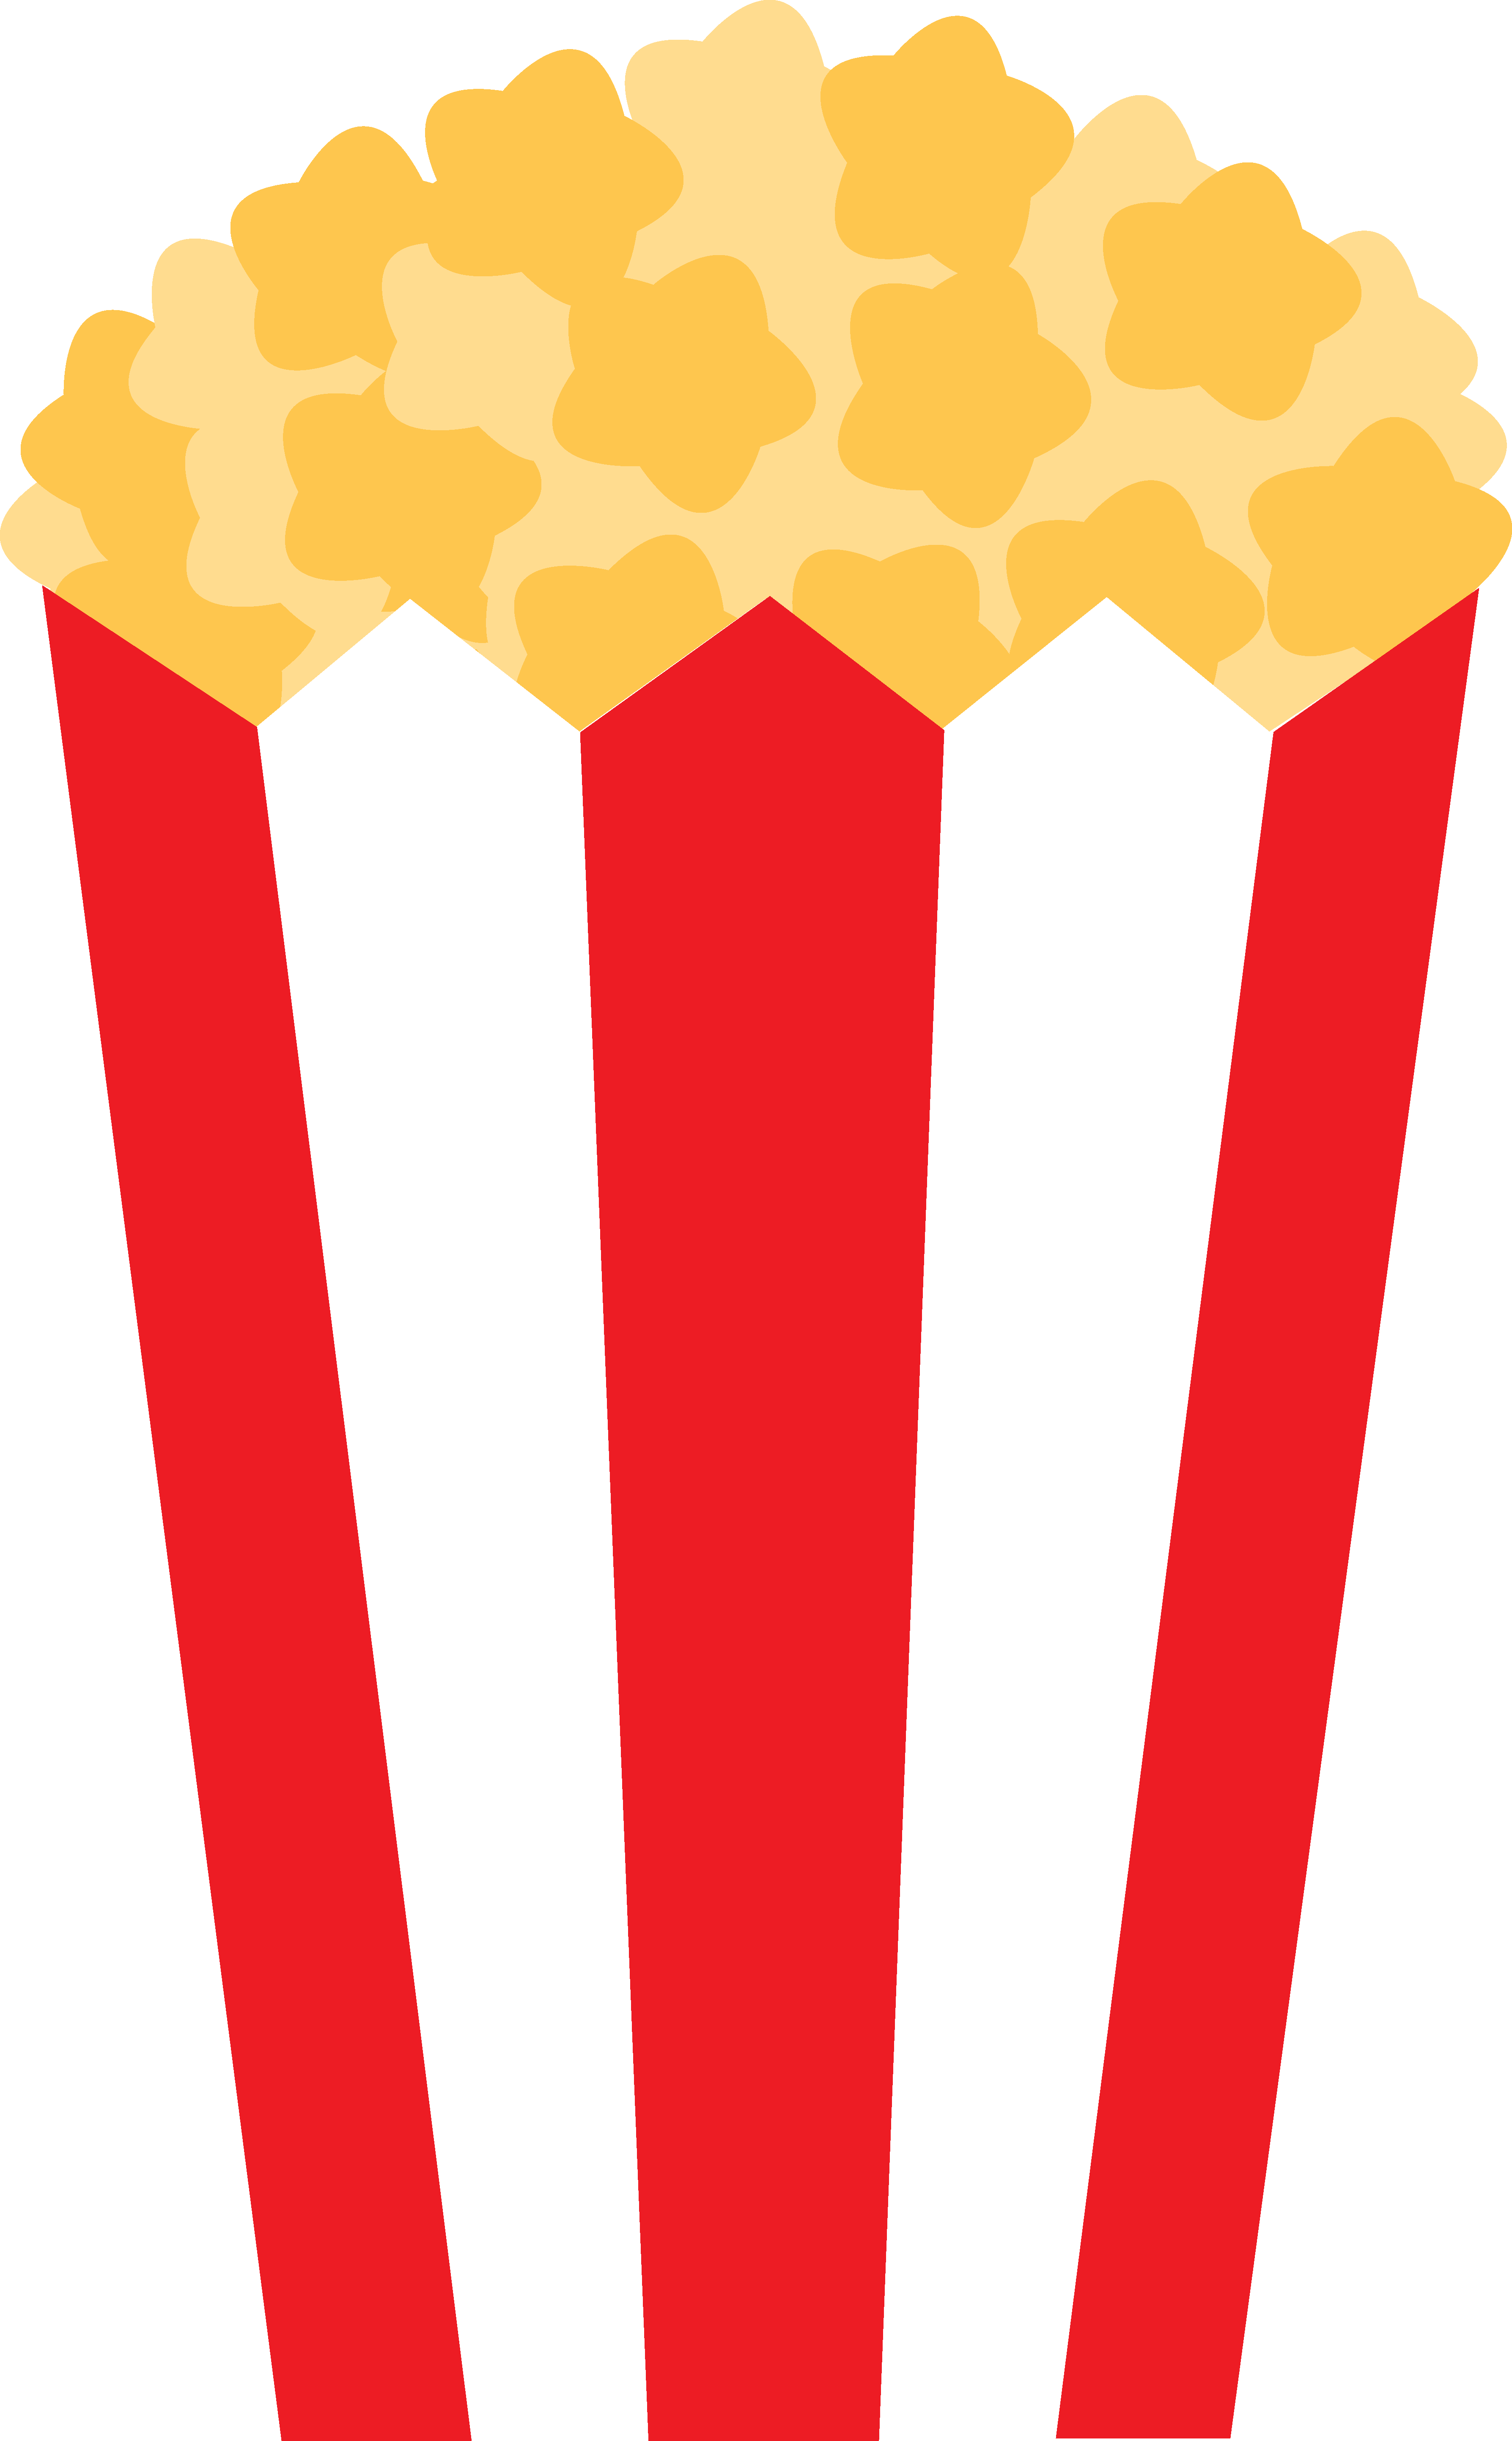 Movie panda images popcornclipart. Free clipart popcorn